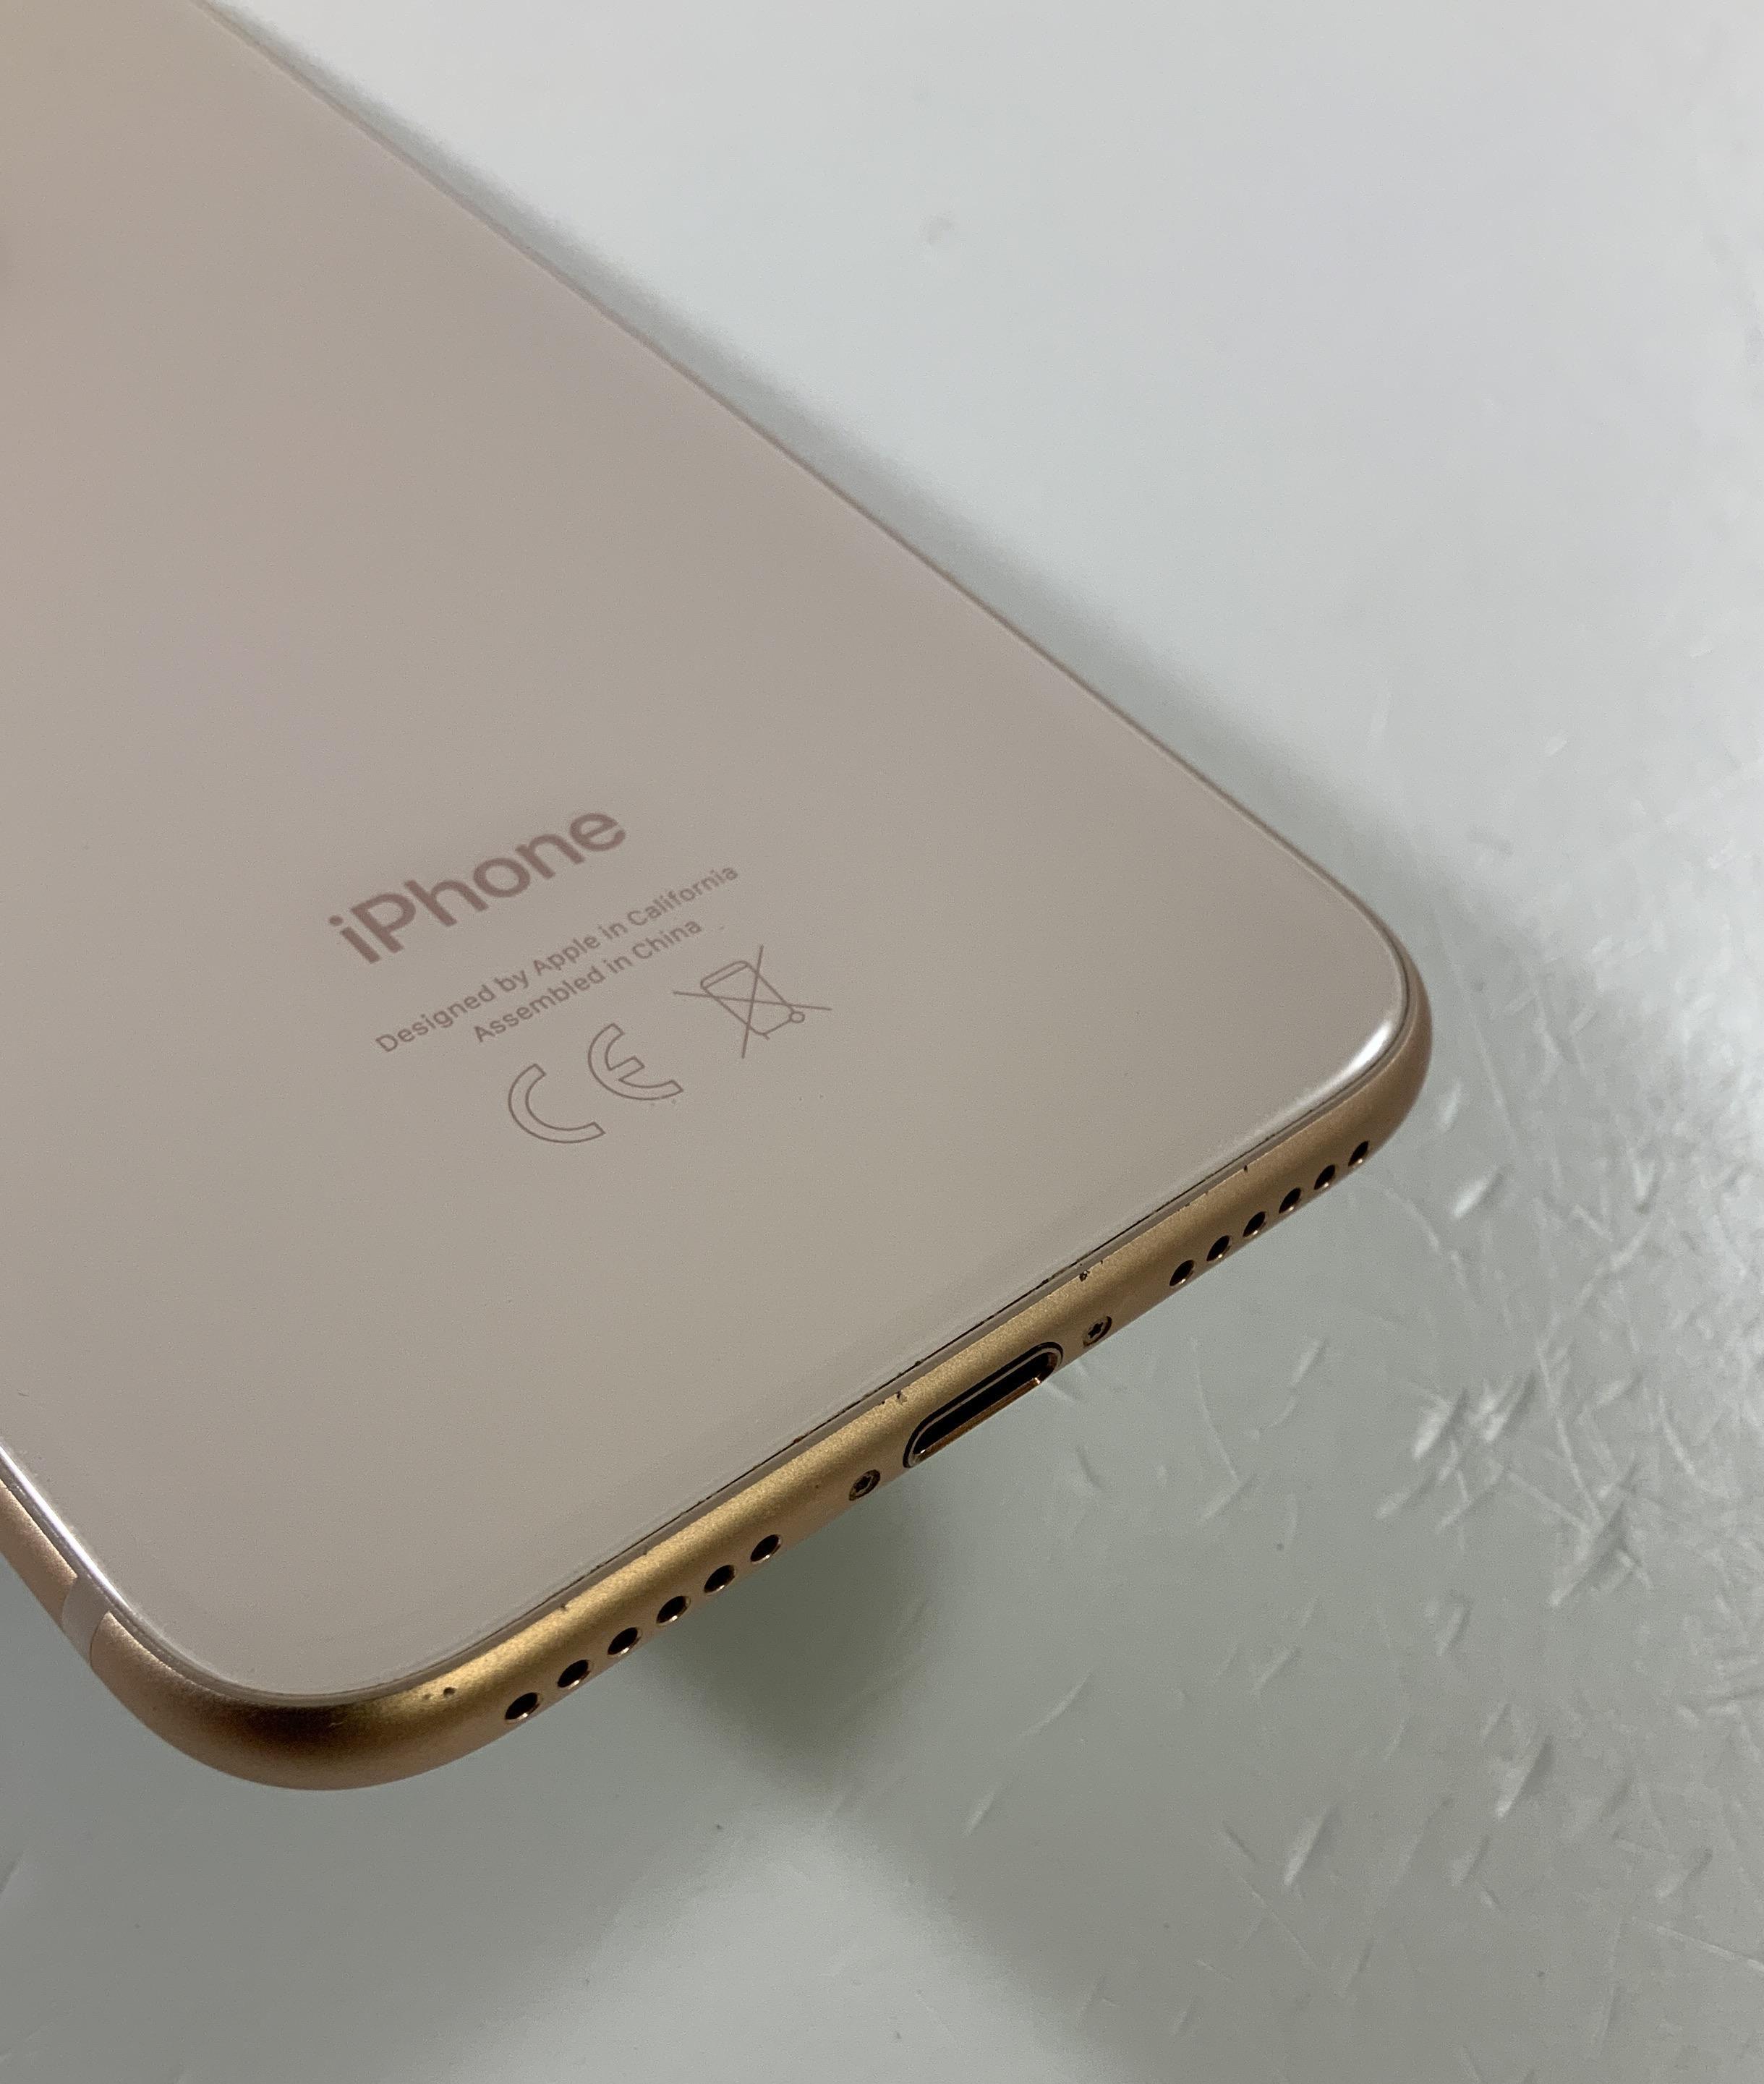 iPhone 8 64GB, 64GB, Gold, Afbeelding 4